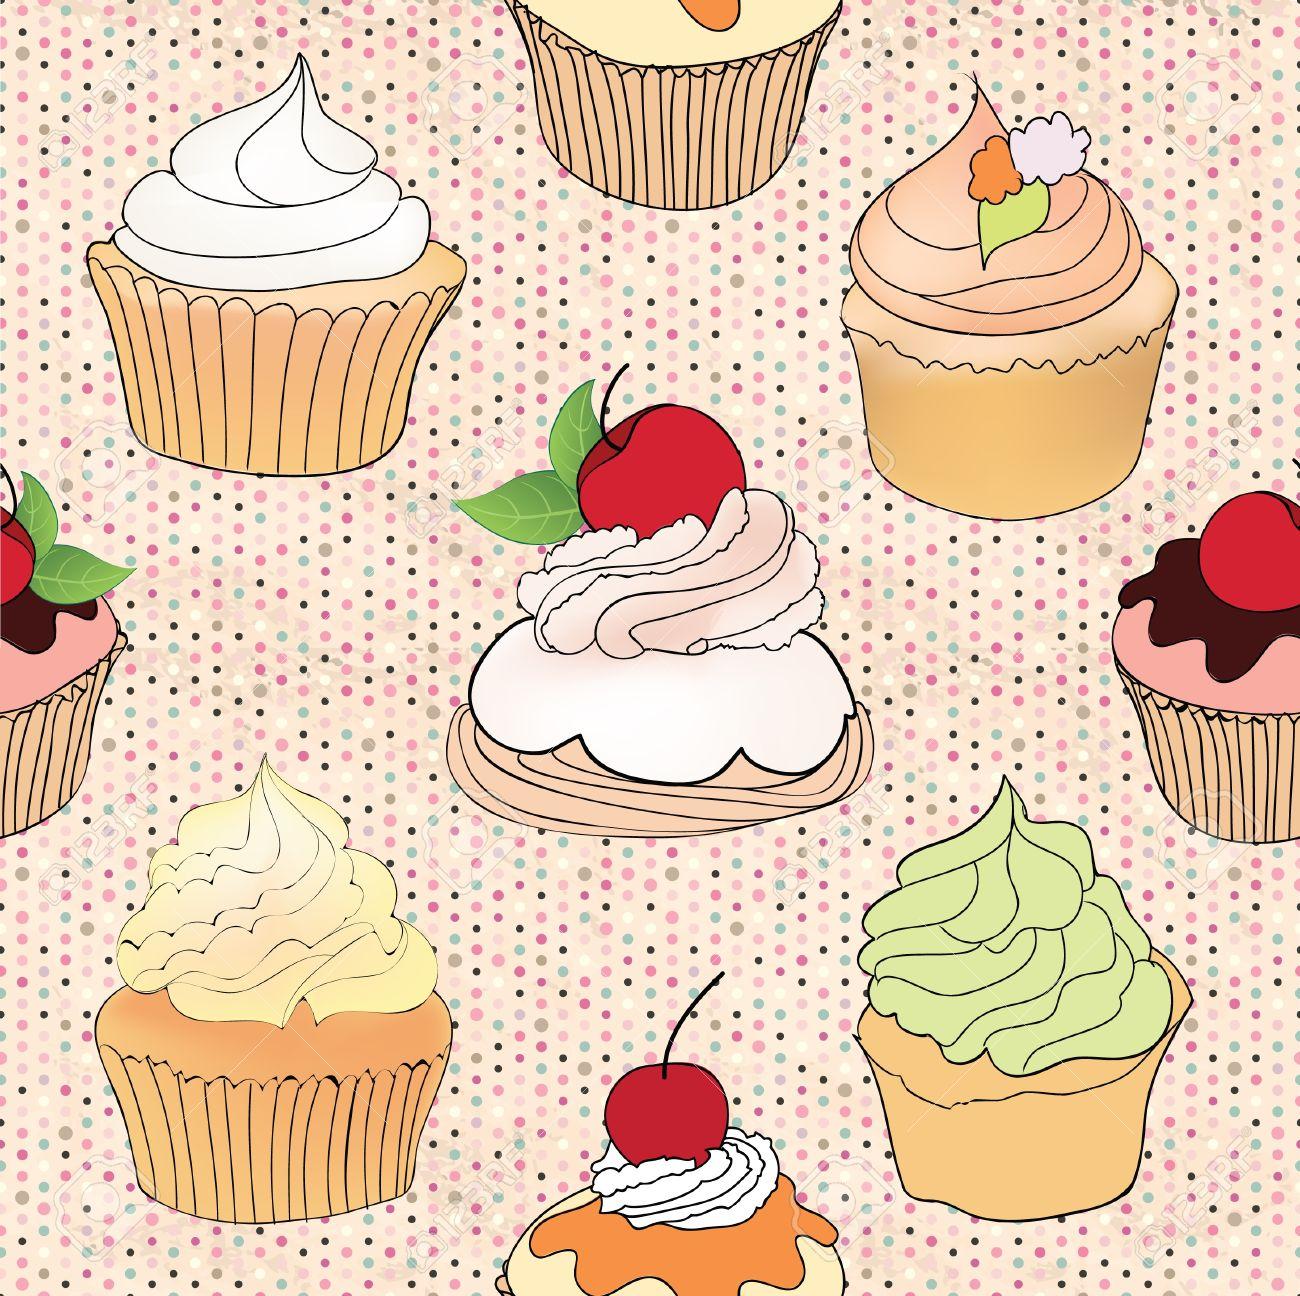 Kitchen wallpaper retro - Wallpaper Kitchen Pattern Pastry Seamless Retro Pattern Muffin Illustration In Retro Style Over Polka Dot